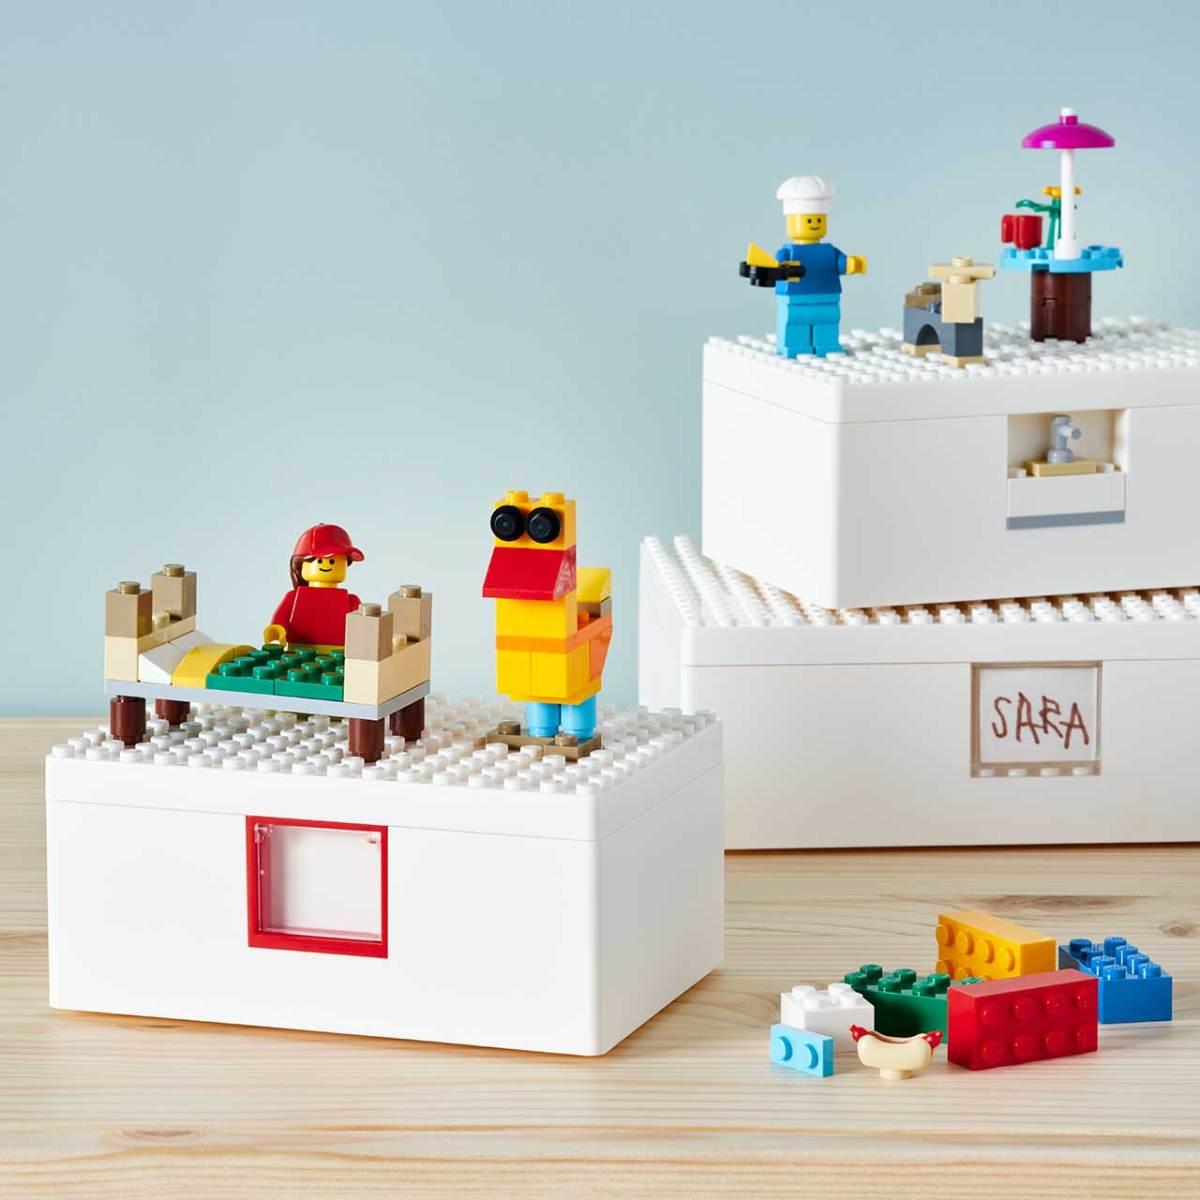 BYGGLEK-IKEA-Lego-storage-boxes-3